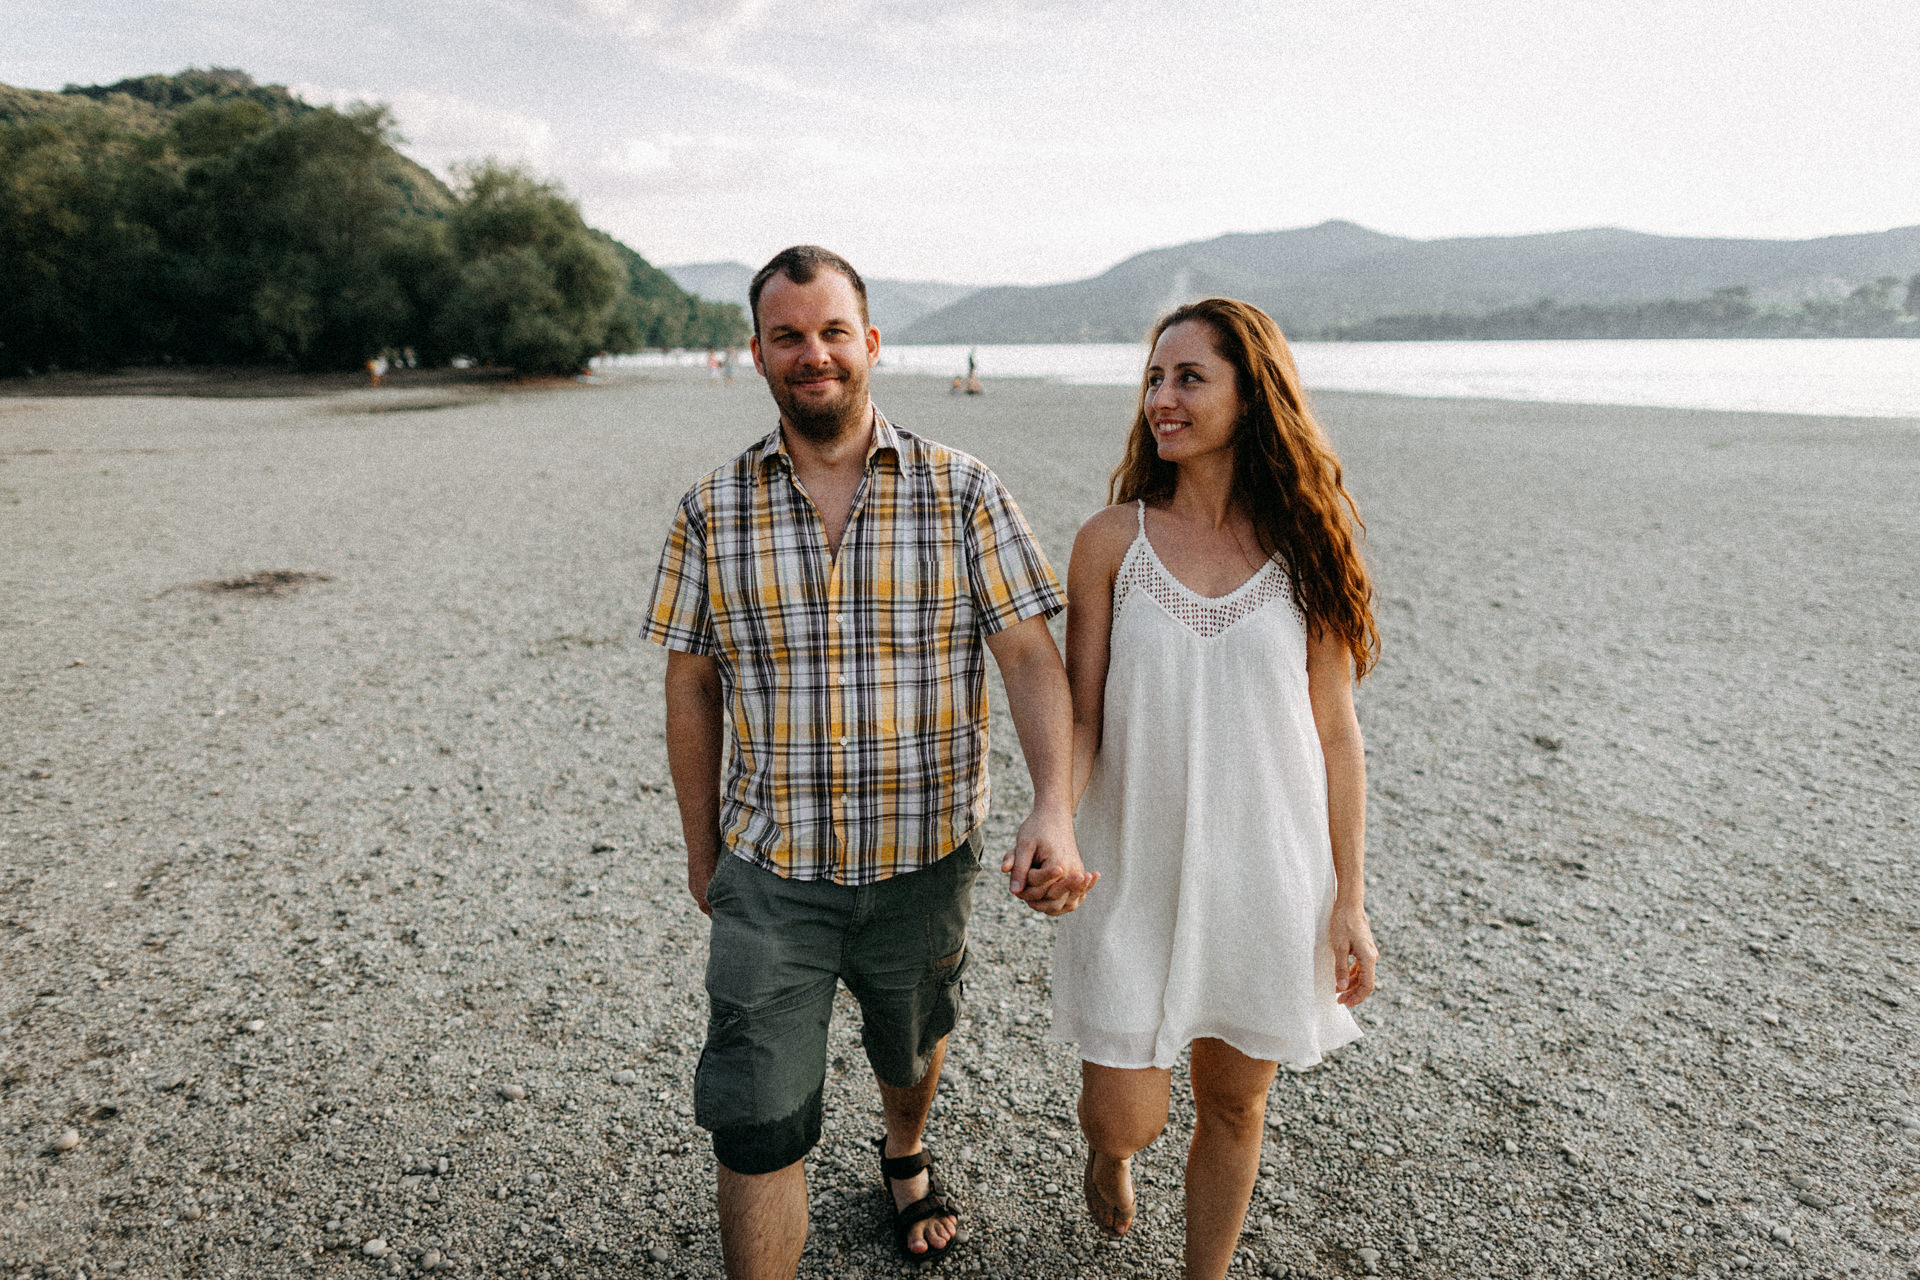 kisoroszi szigetcsucs jegyes fotozas